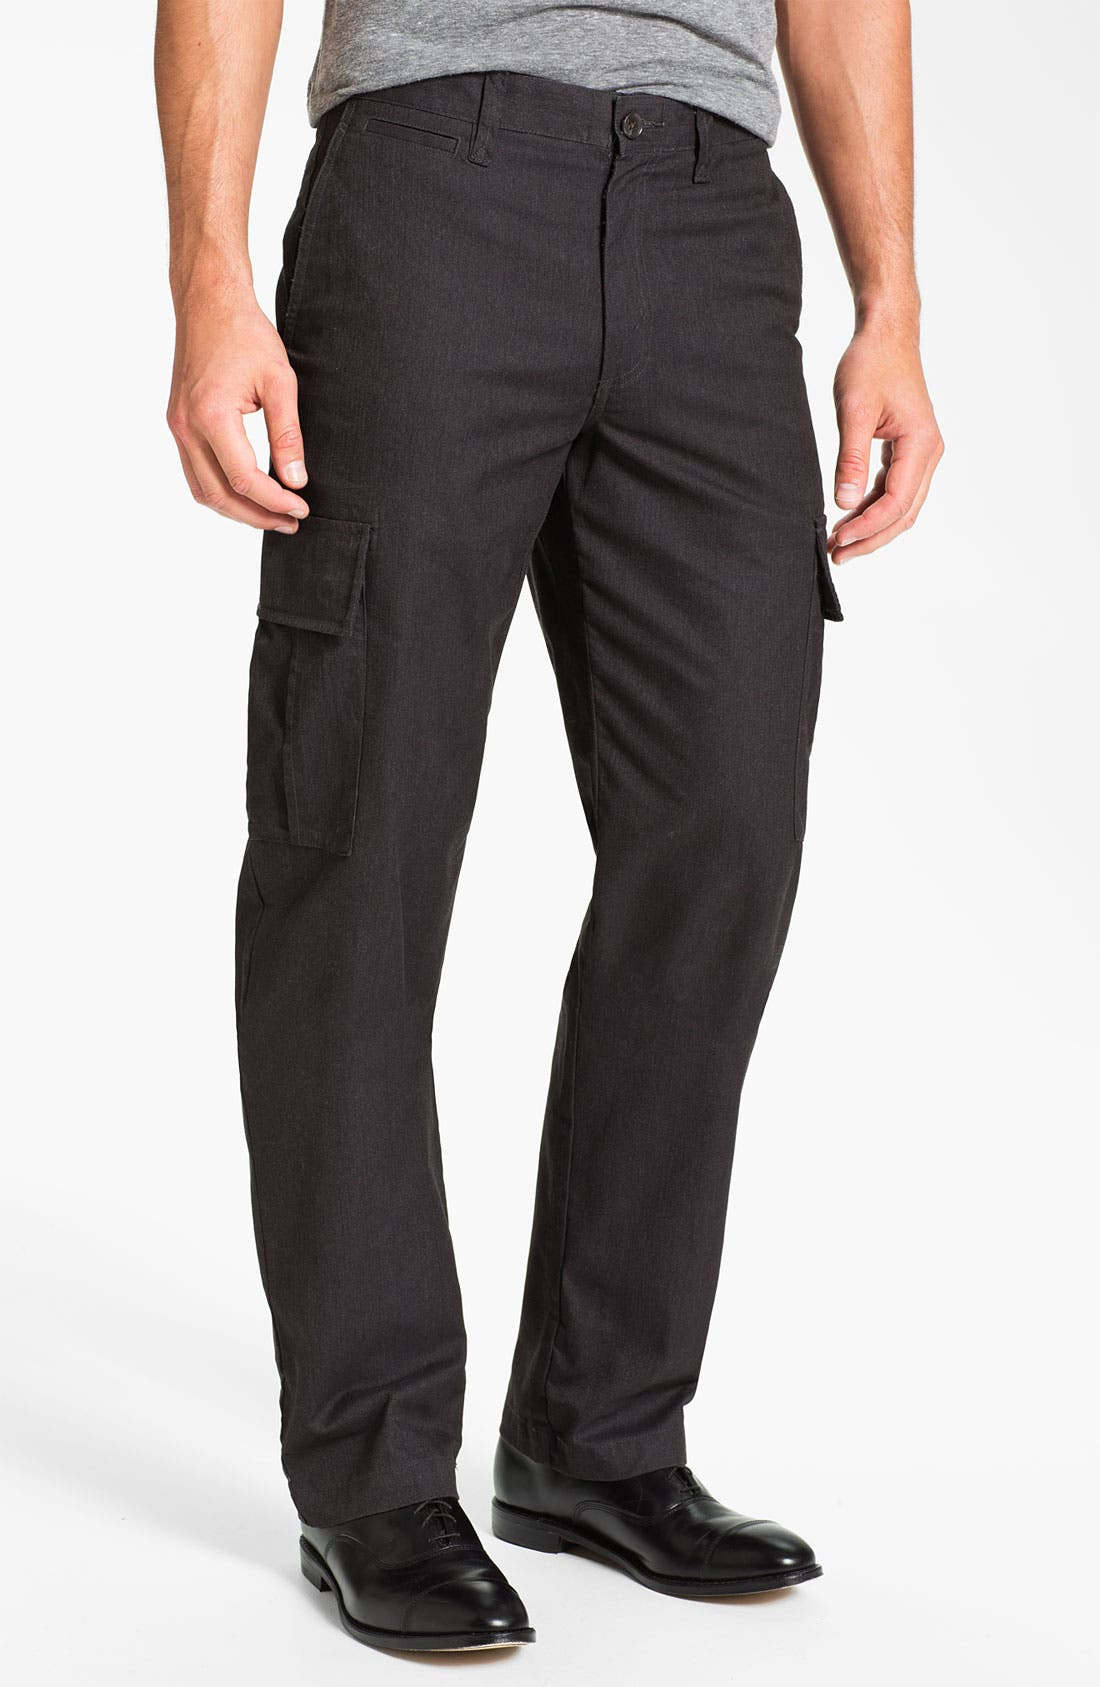 Main Image - Wallin & Bros. 'Milner' Cargo Pants